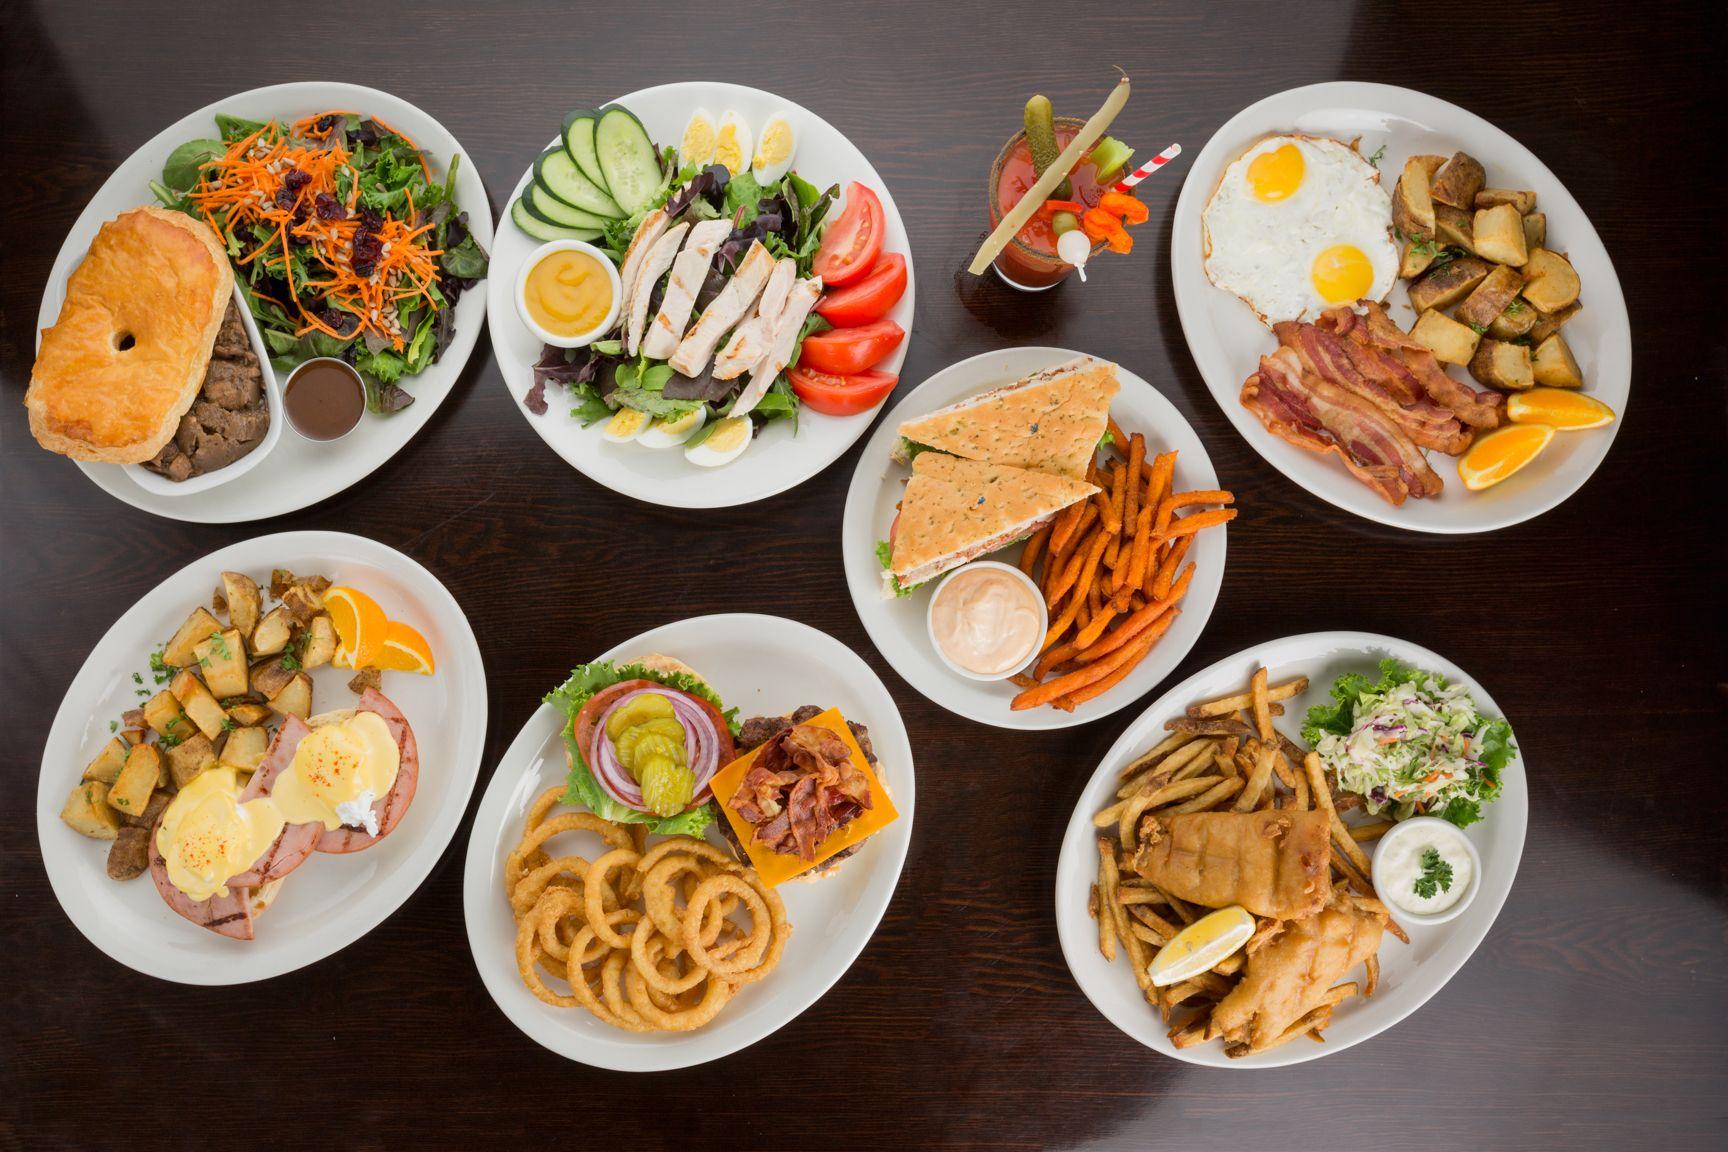 📸  : Marlboro Wang  #bookfocal #foodphotography #foodphotographer #foodphotoshoot #foodpics